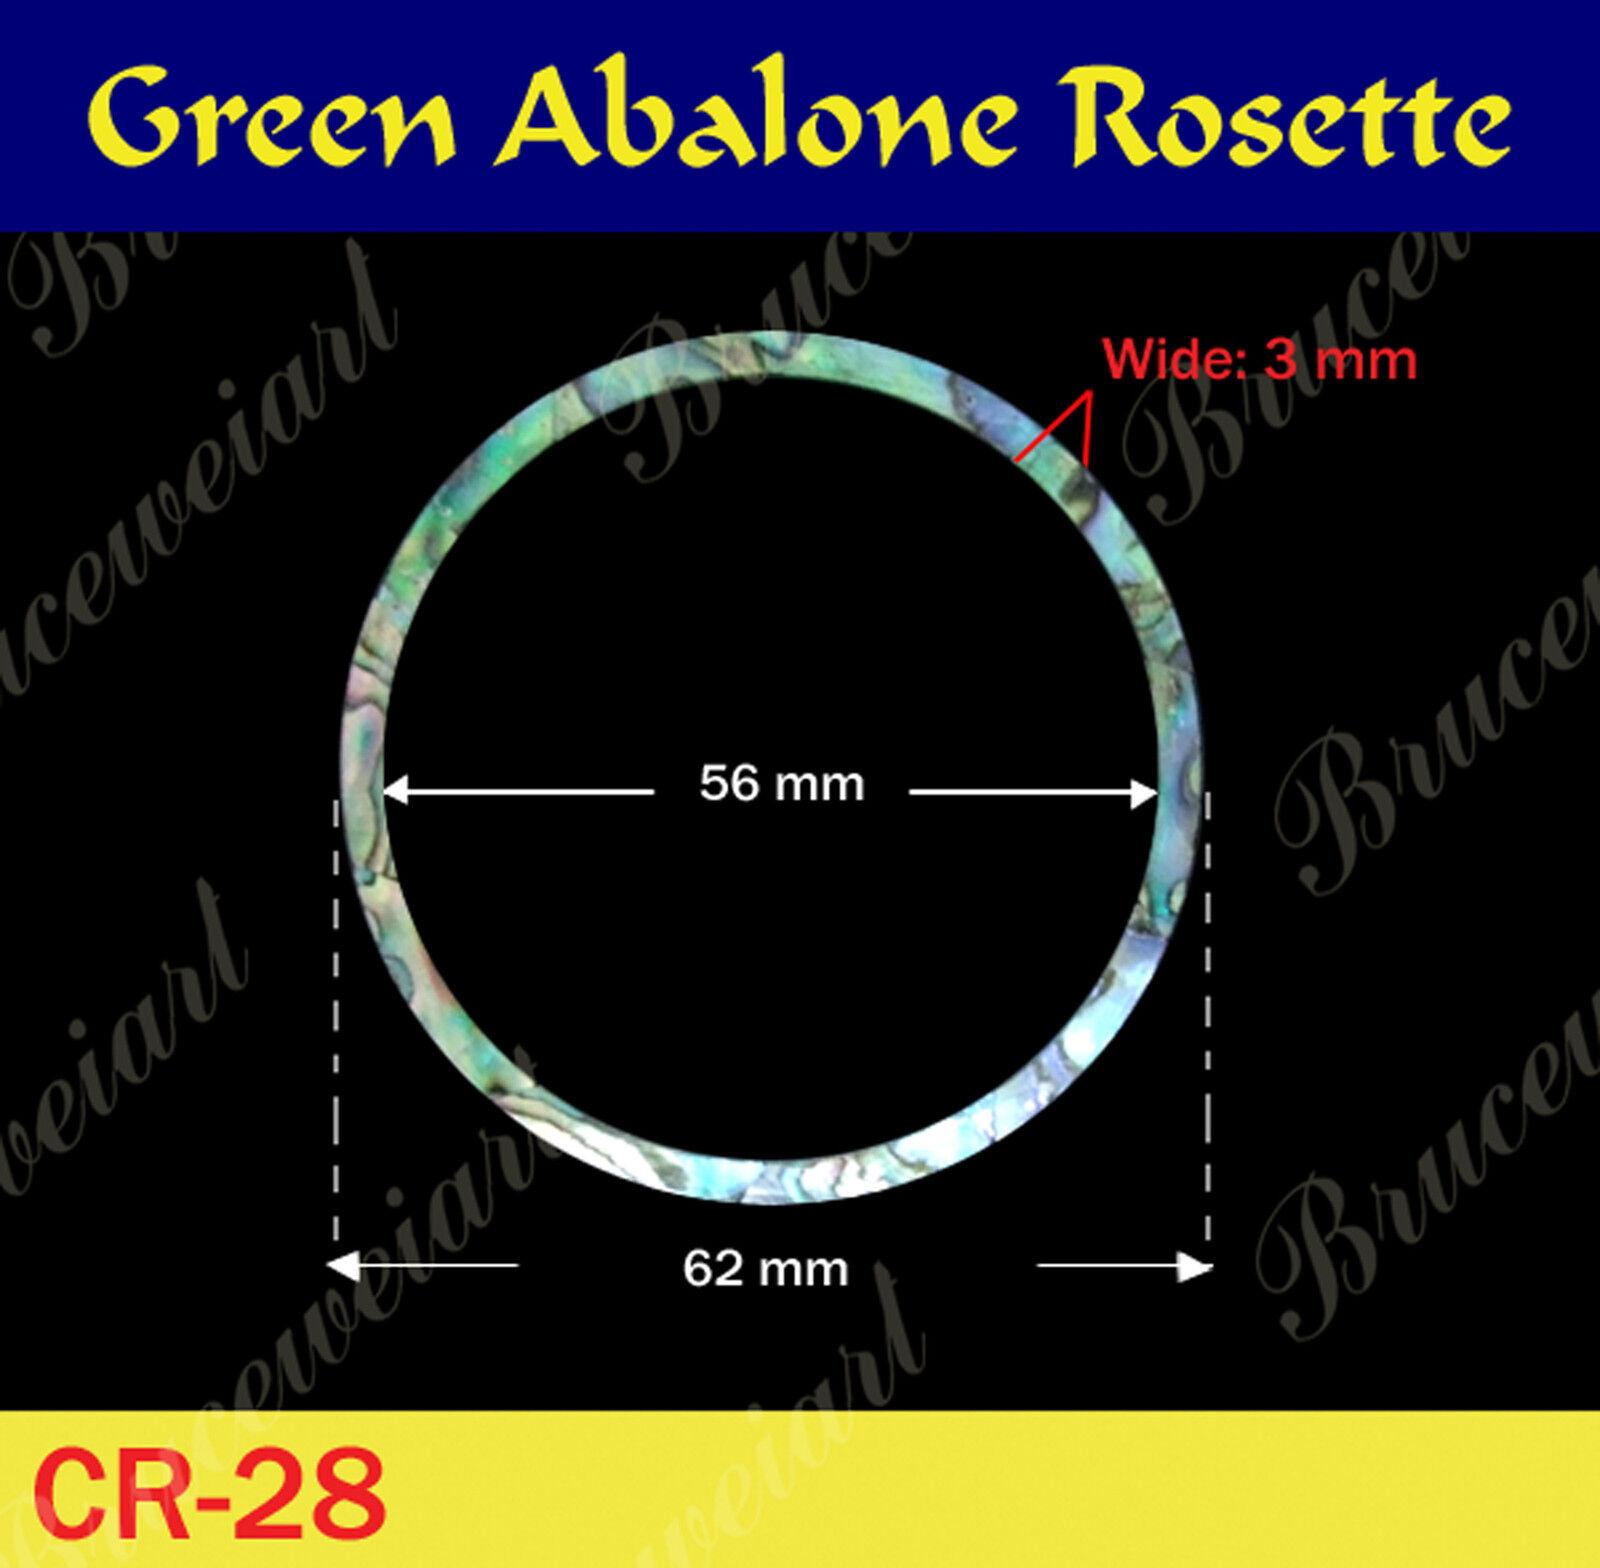 Free Shipping, 5pcs - Green Abalone pinktte   inside= 56mm, W=3 mm (GCR28)